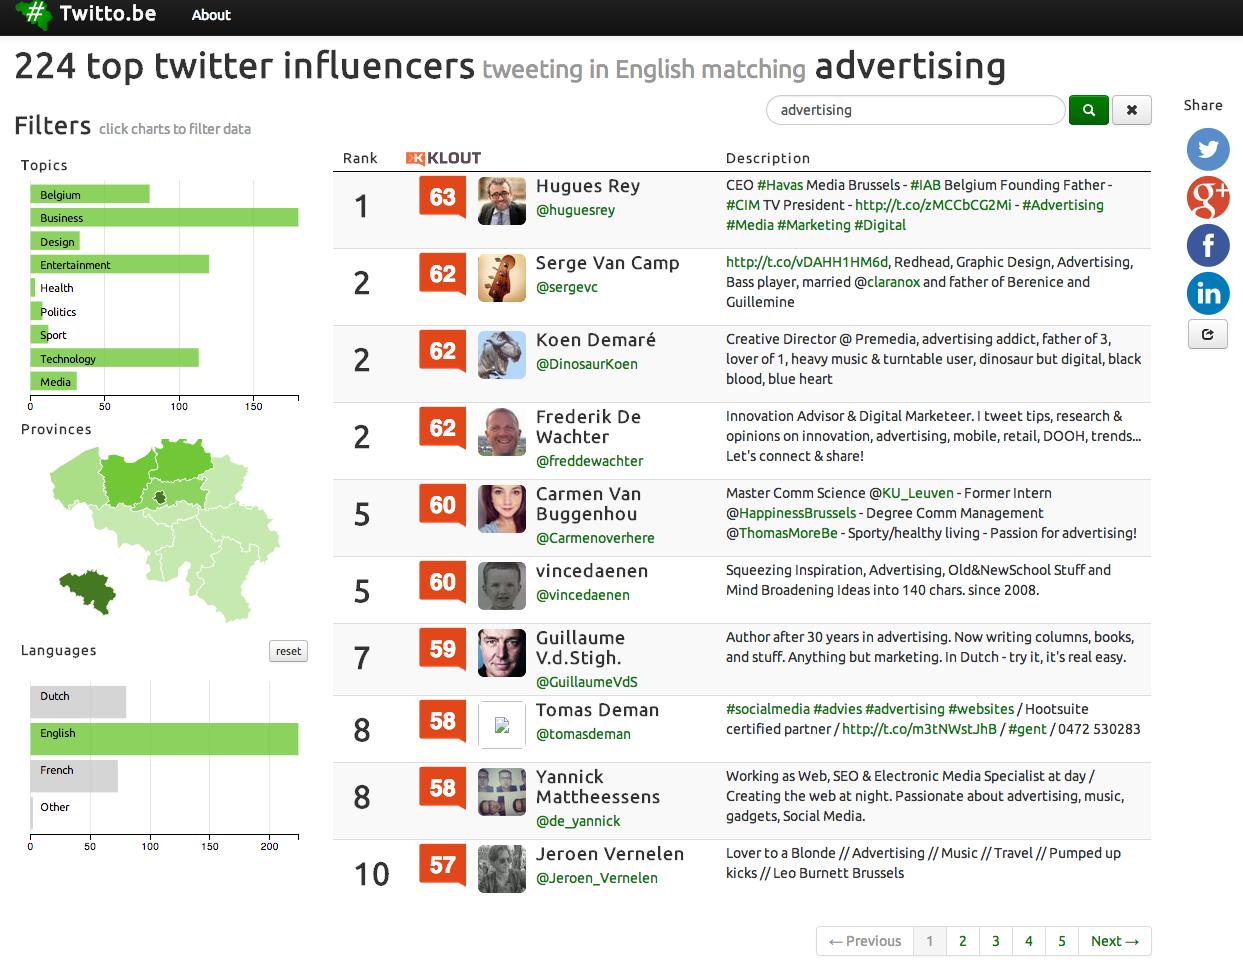 #1 of the 224 top twitter influencers tweeting in English matching advertising (Belgium)